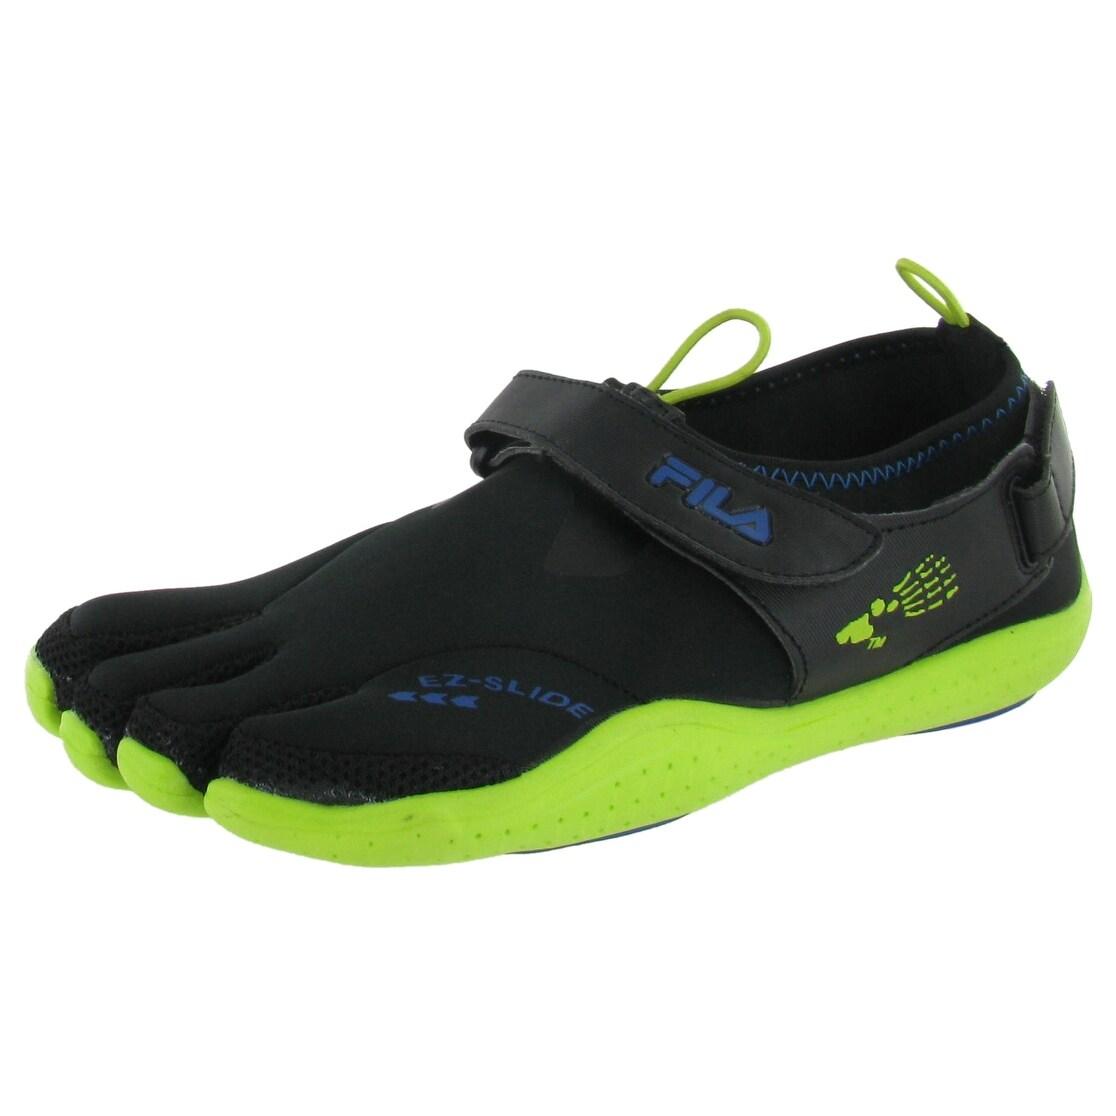 a7352726781d89 Shop Fila Skeletoes Emergence Men's Shoes Minimalist Five Finger ...